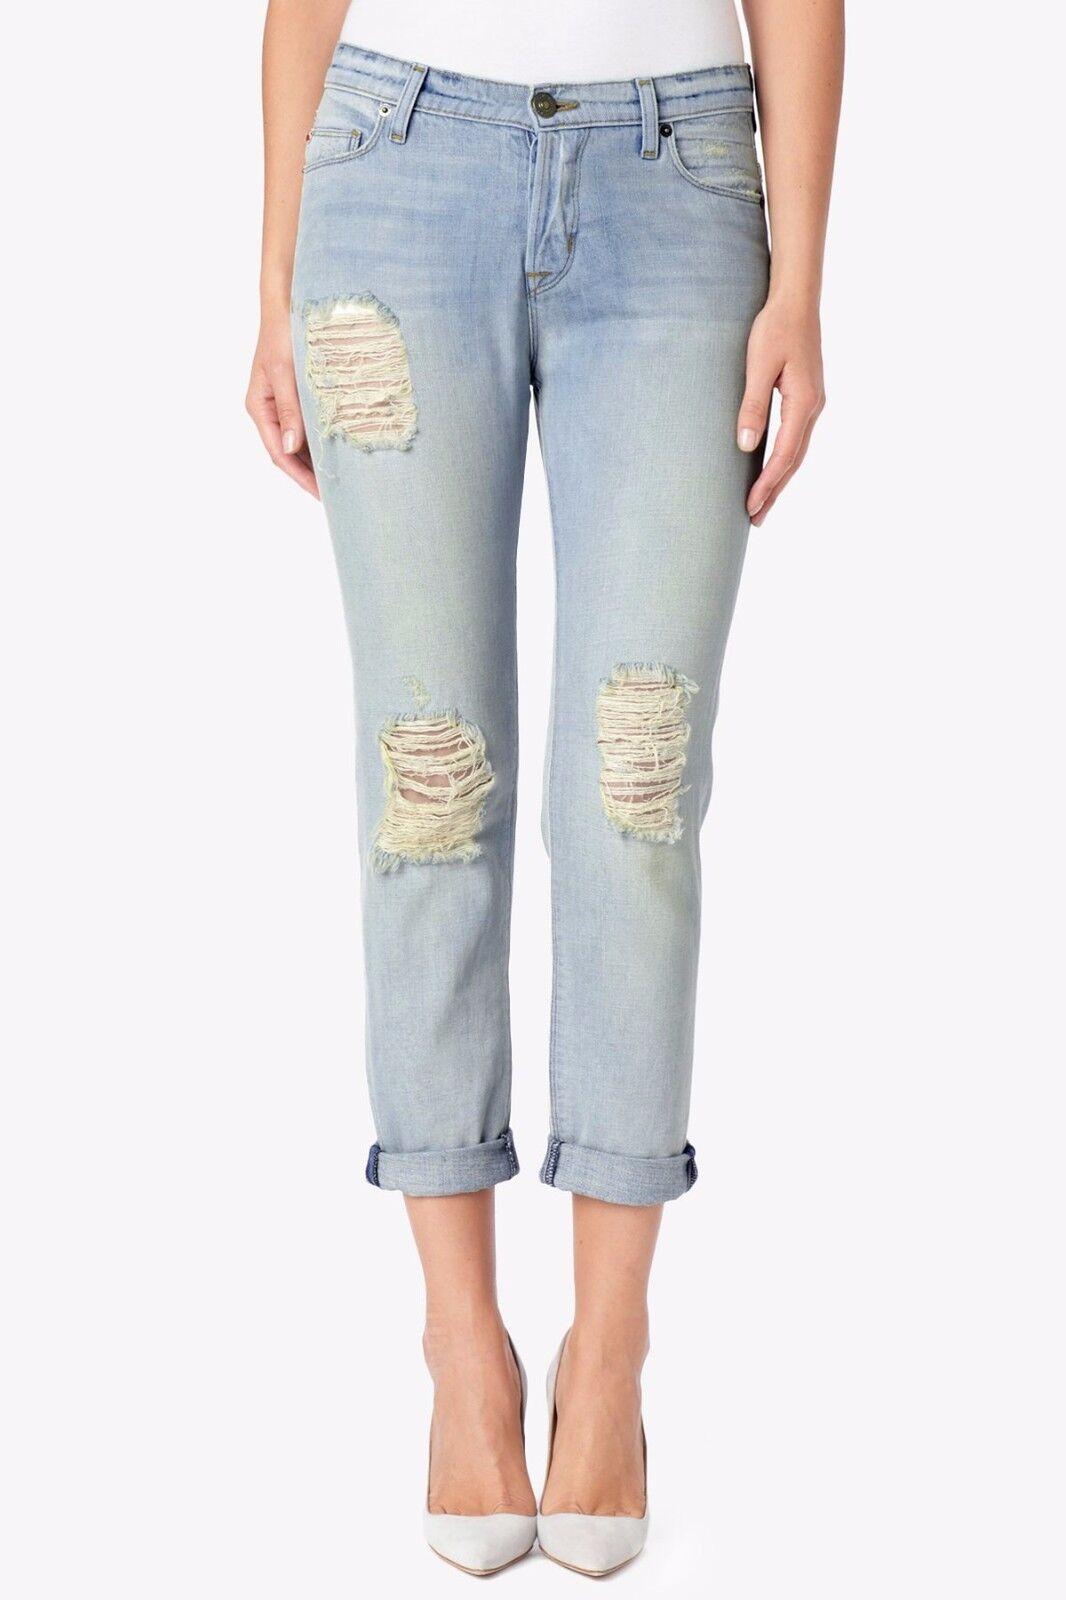 NEW Hudson Leigh Boyfriend Pant Weekend Warrior Jeans SZ 27